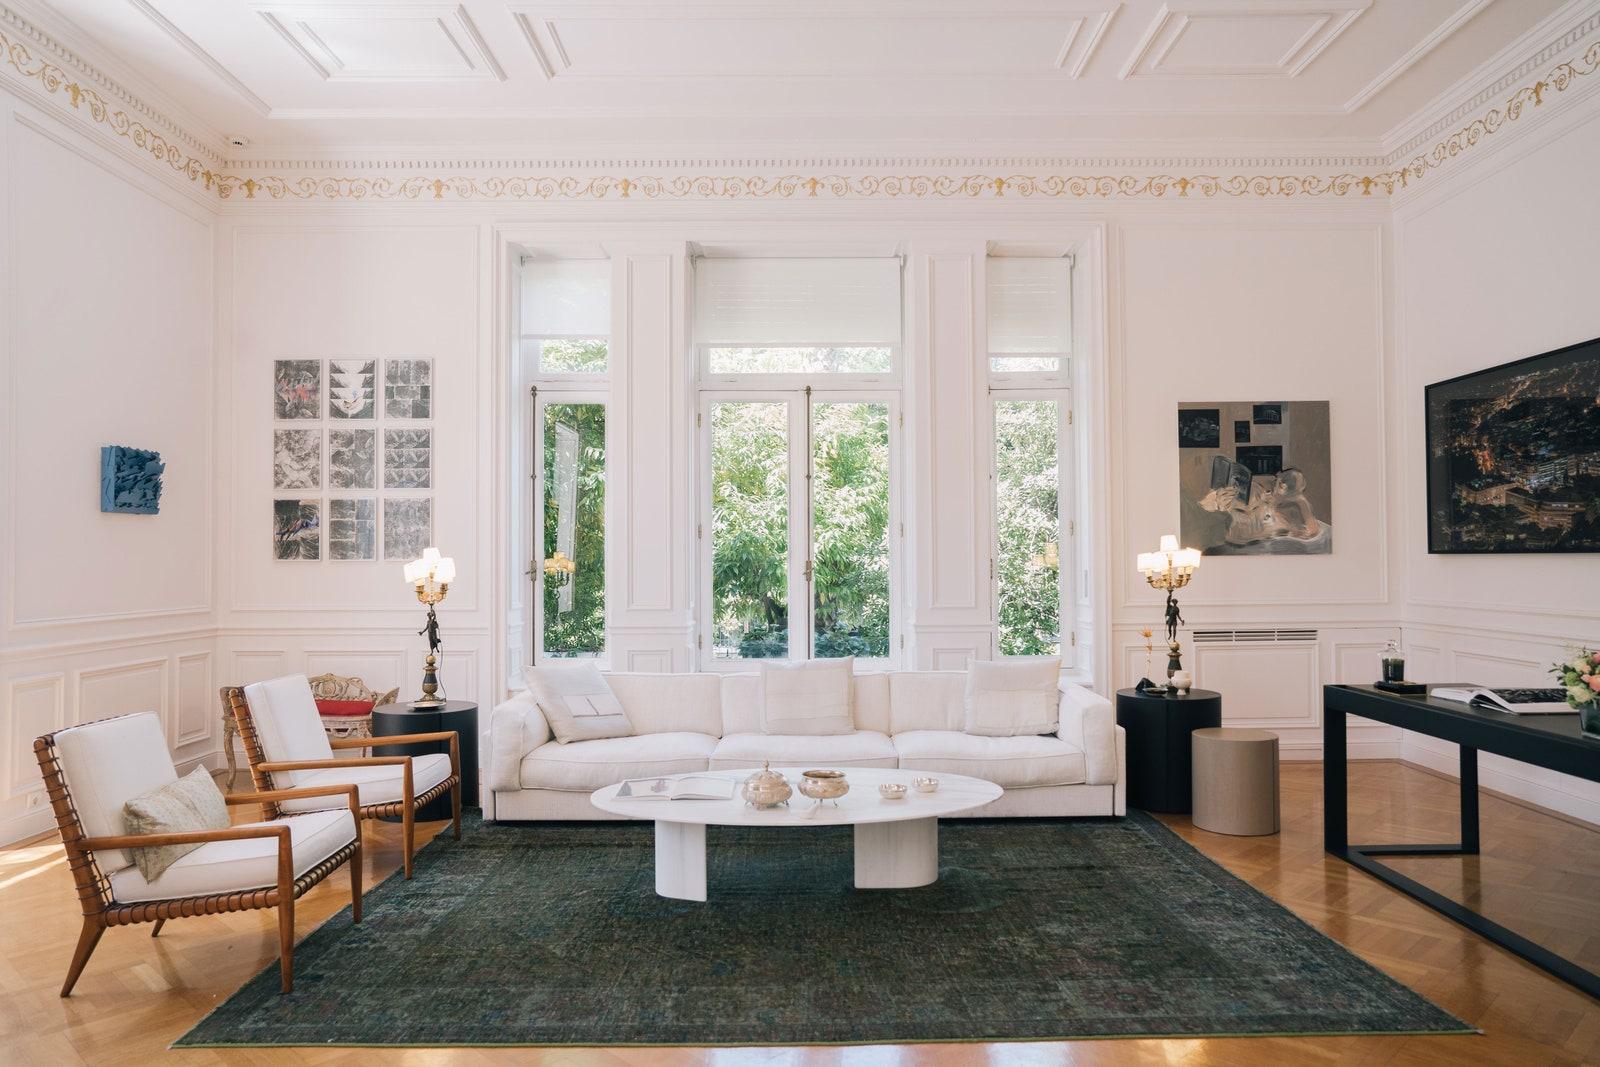 .   Ten Carpets  Soutzoglou    onentropy        Saridis.       III     .           .             .